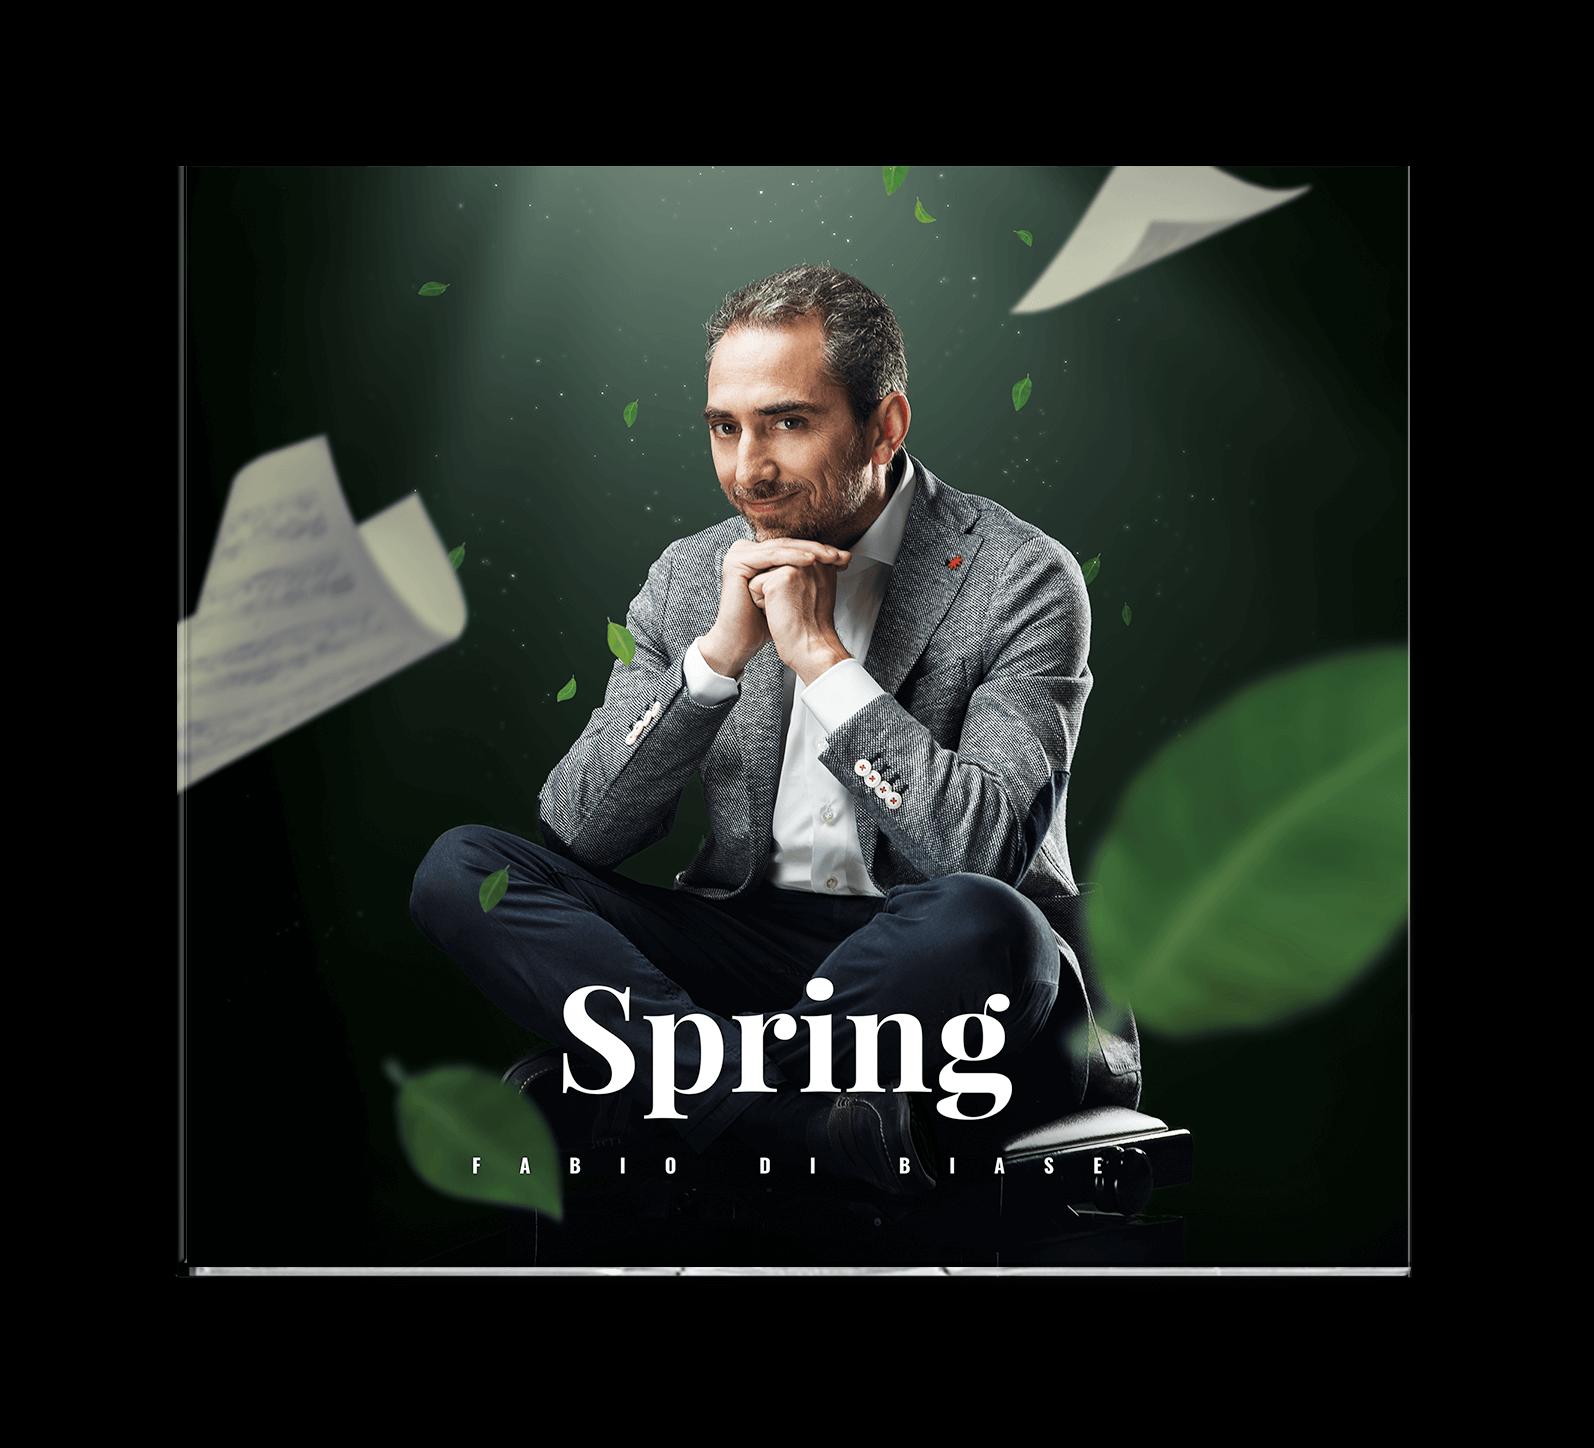 Cd art cover Spring Fabio di Biase